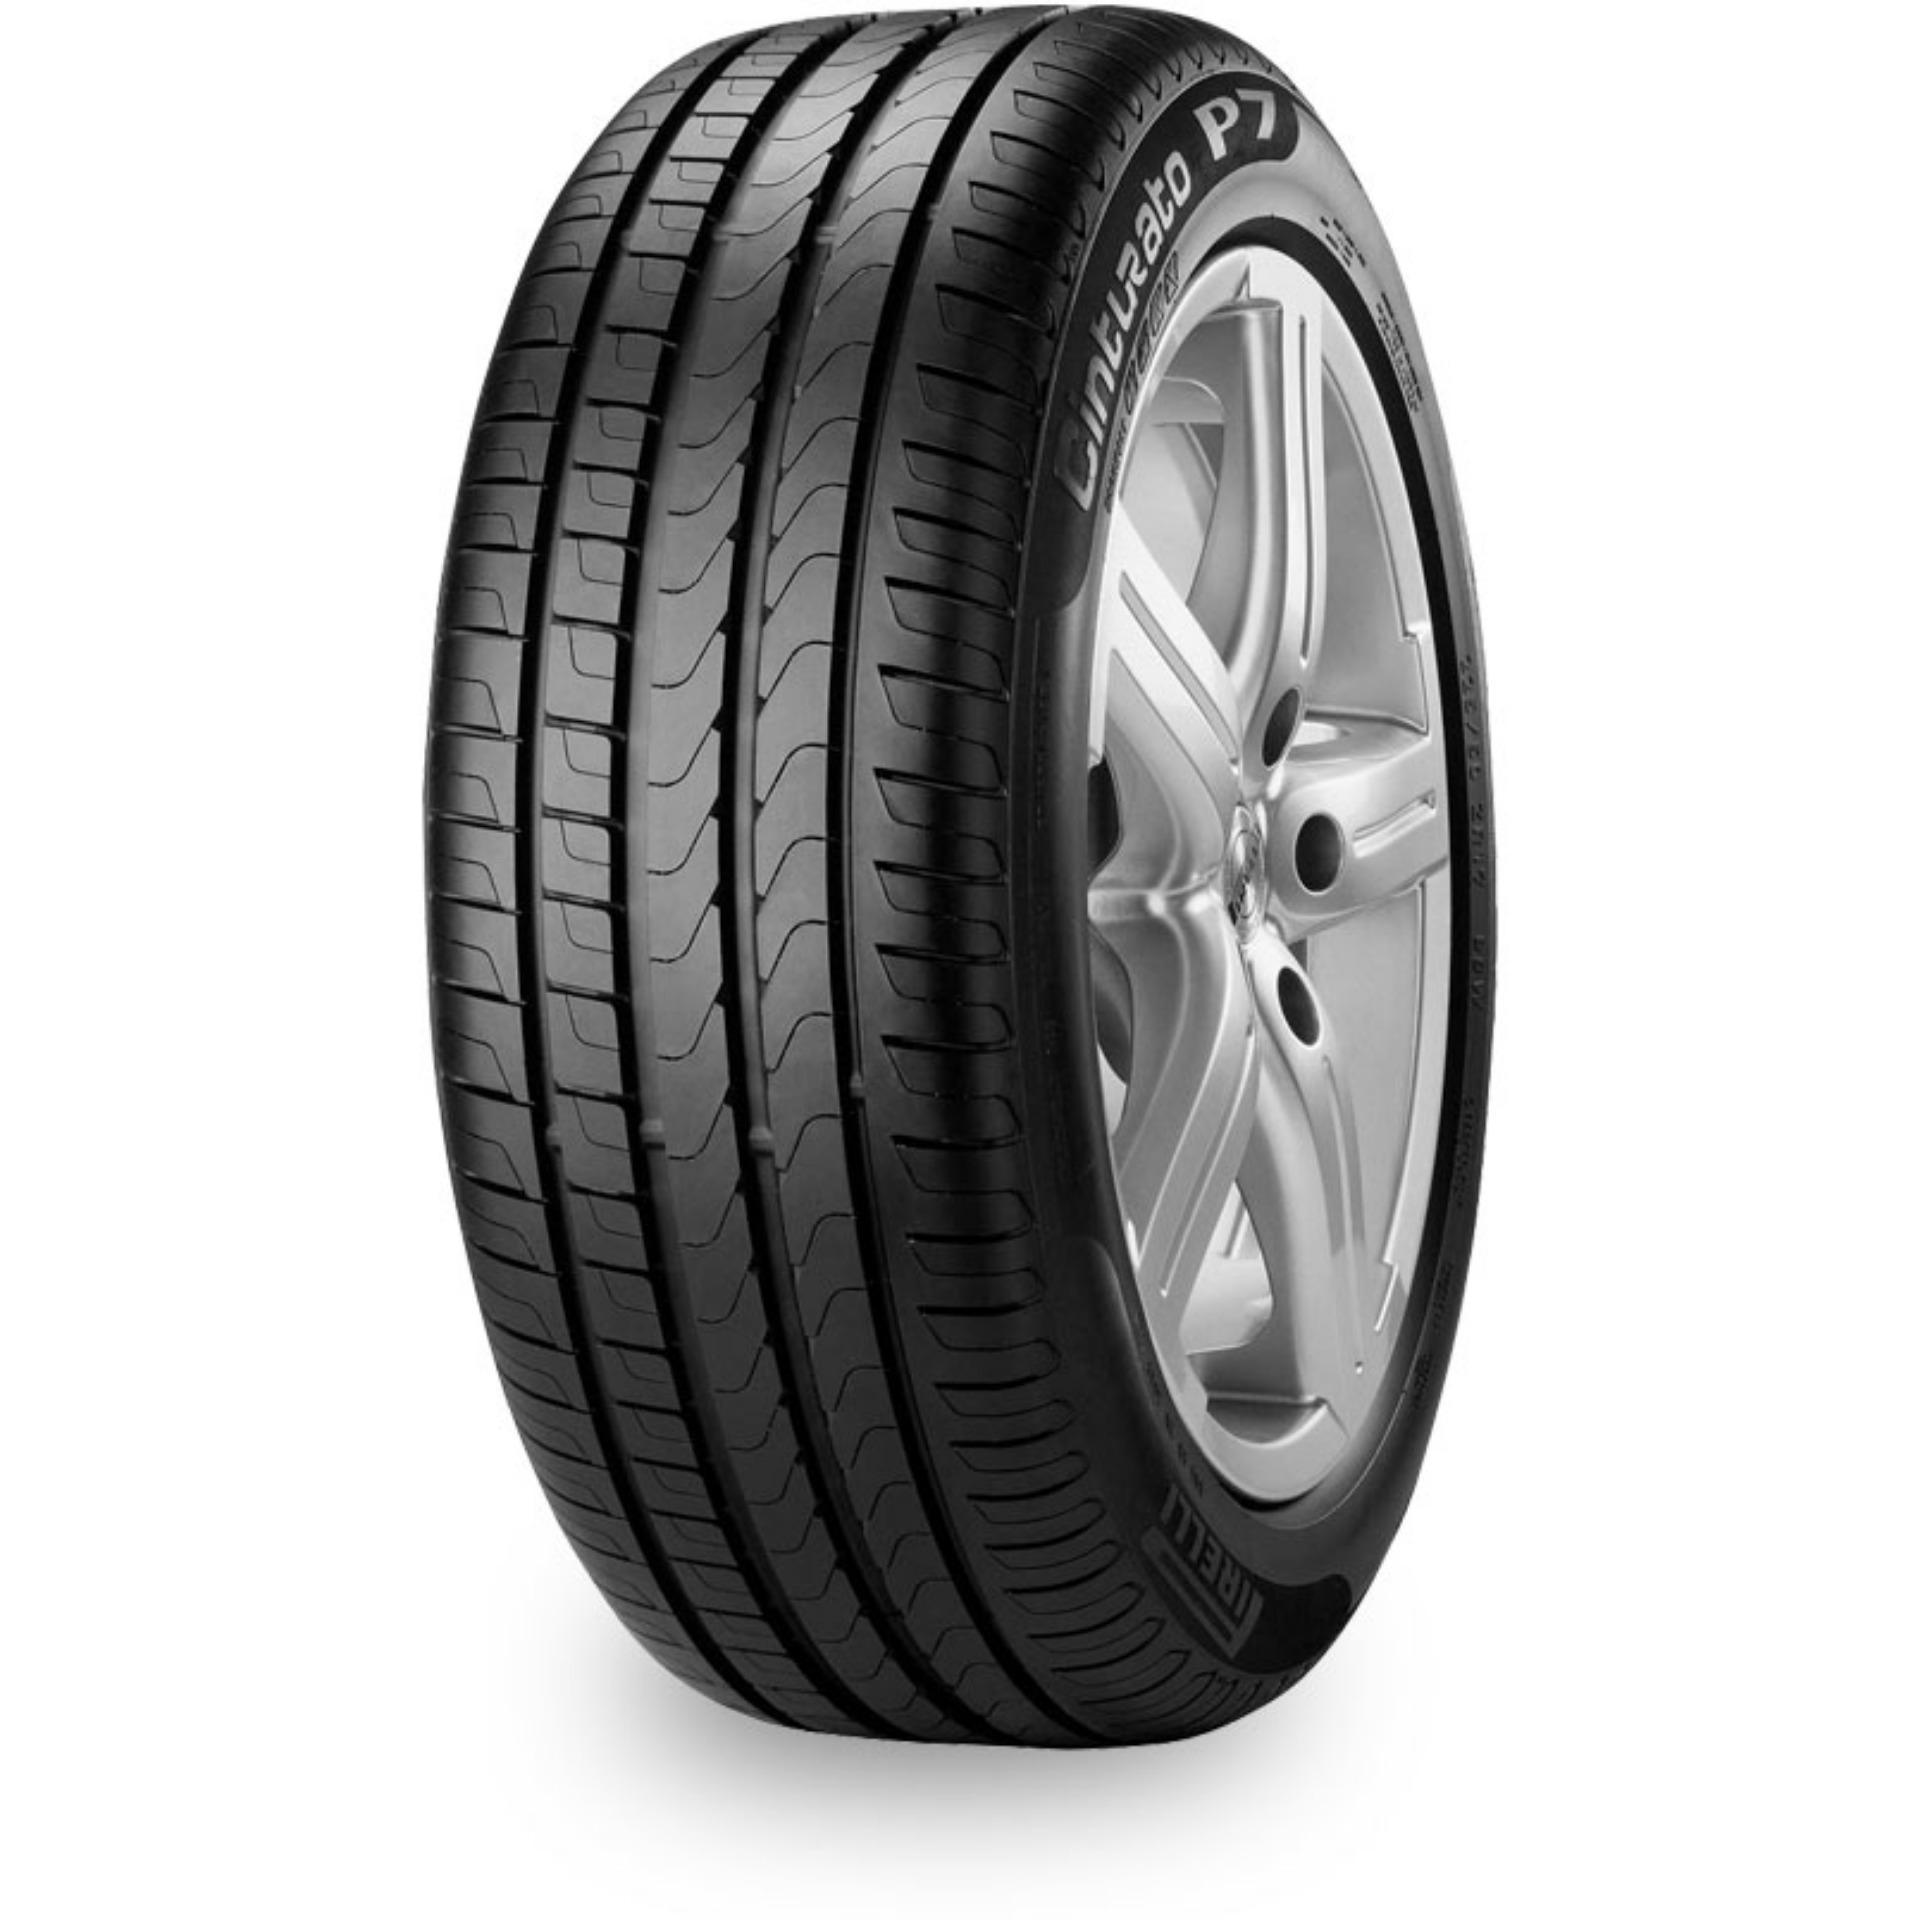 Pirelli P7 Cinturato RFT 225/50 R17 Ban Mobil - GRATIS INSTALASI